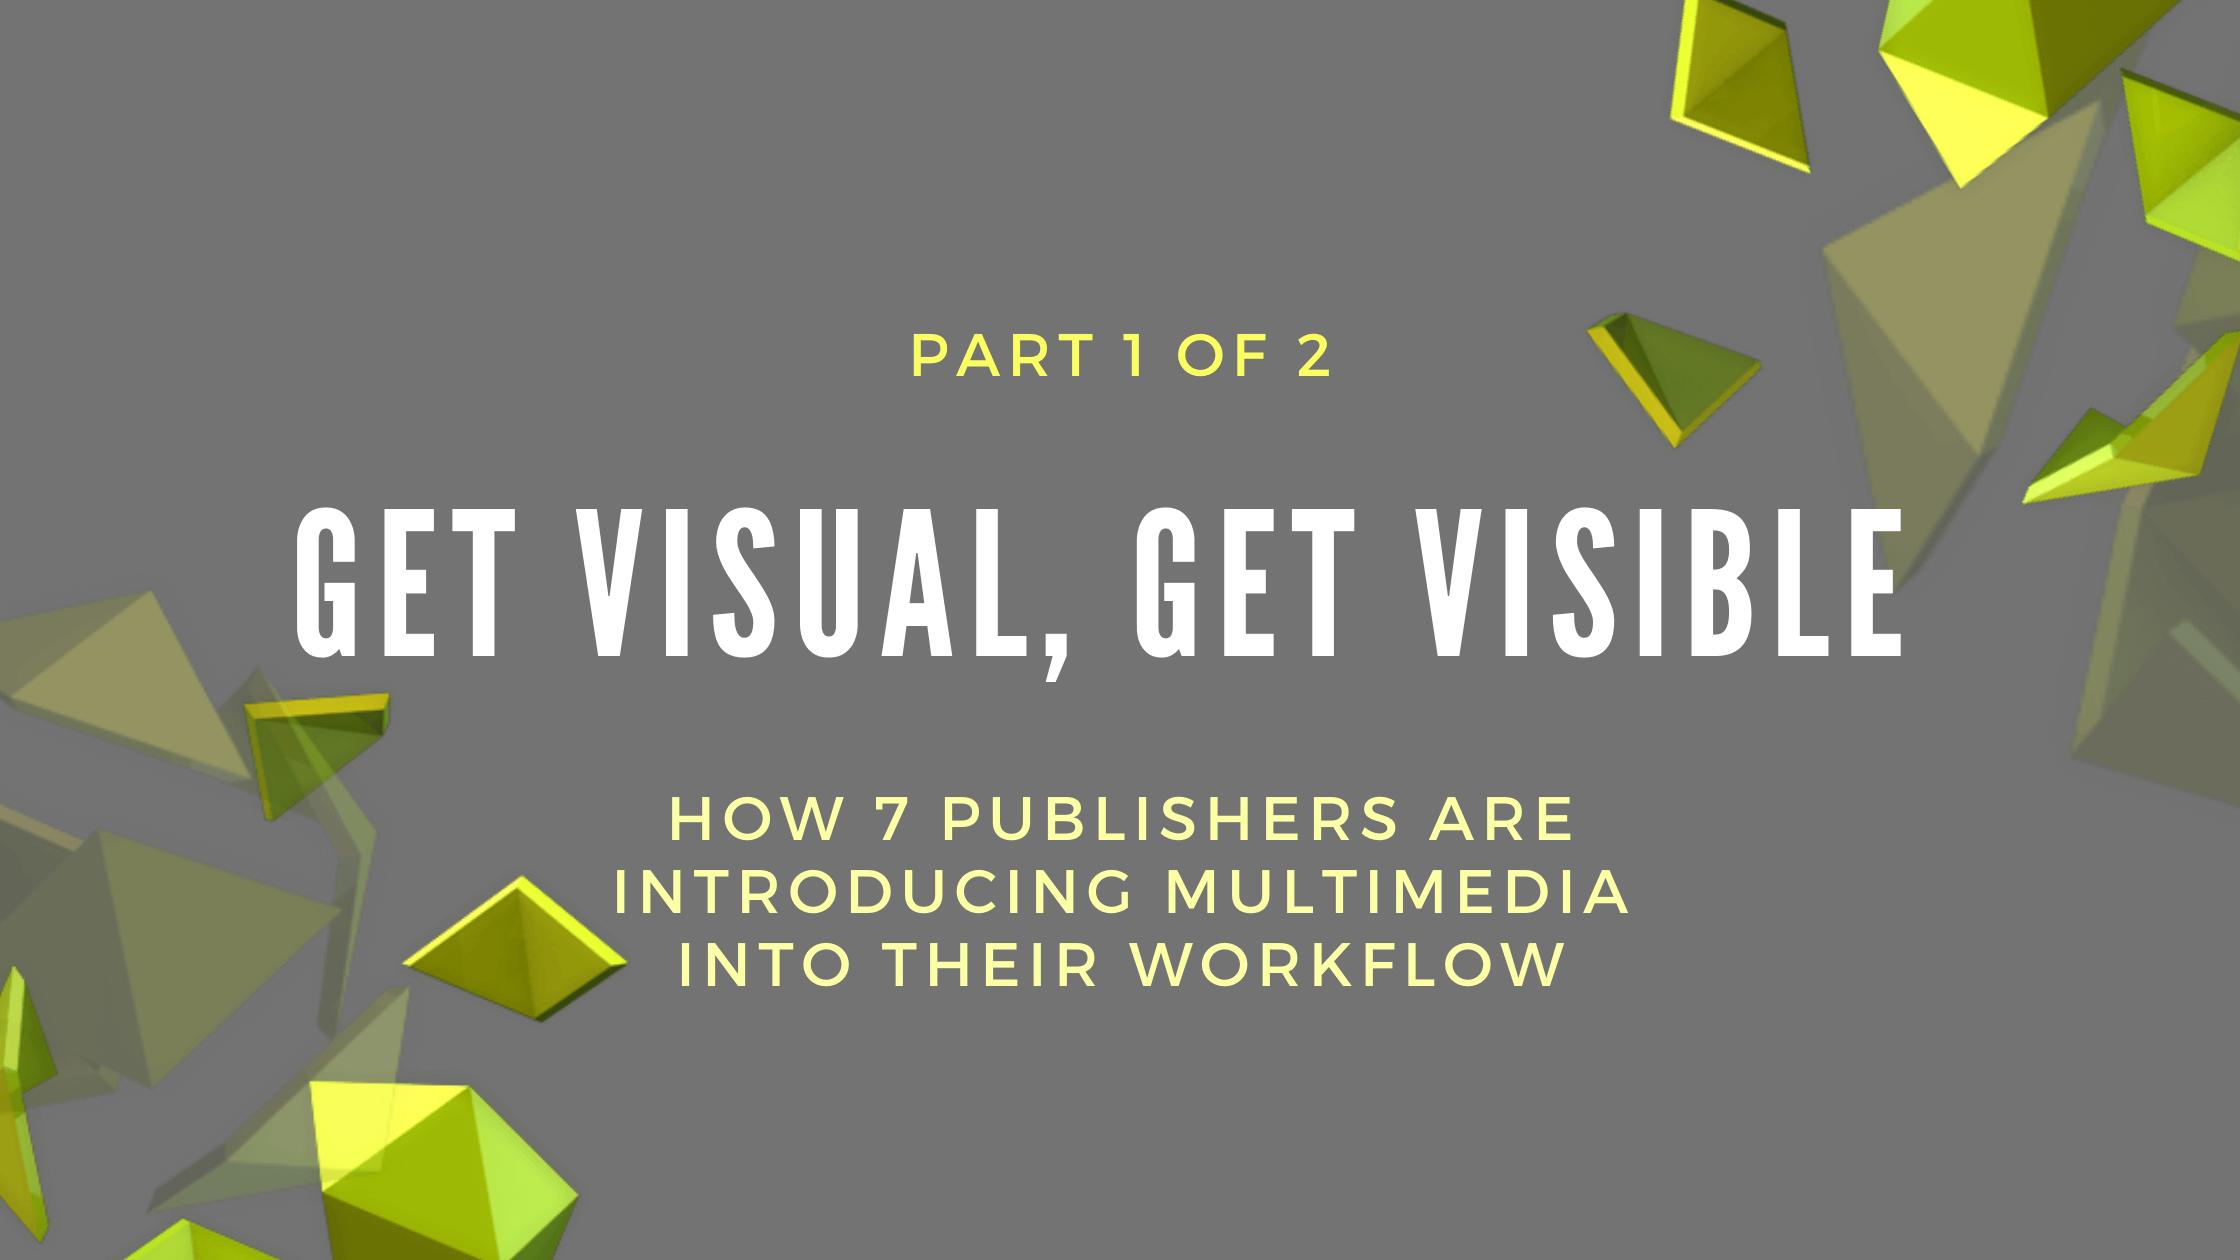 Get Visual, Get Visible